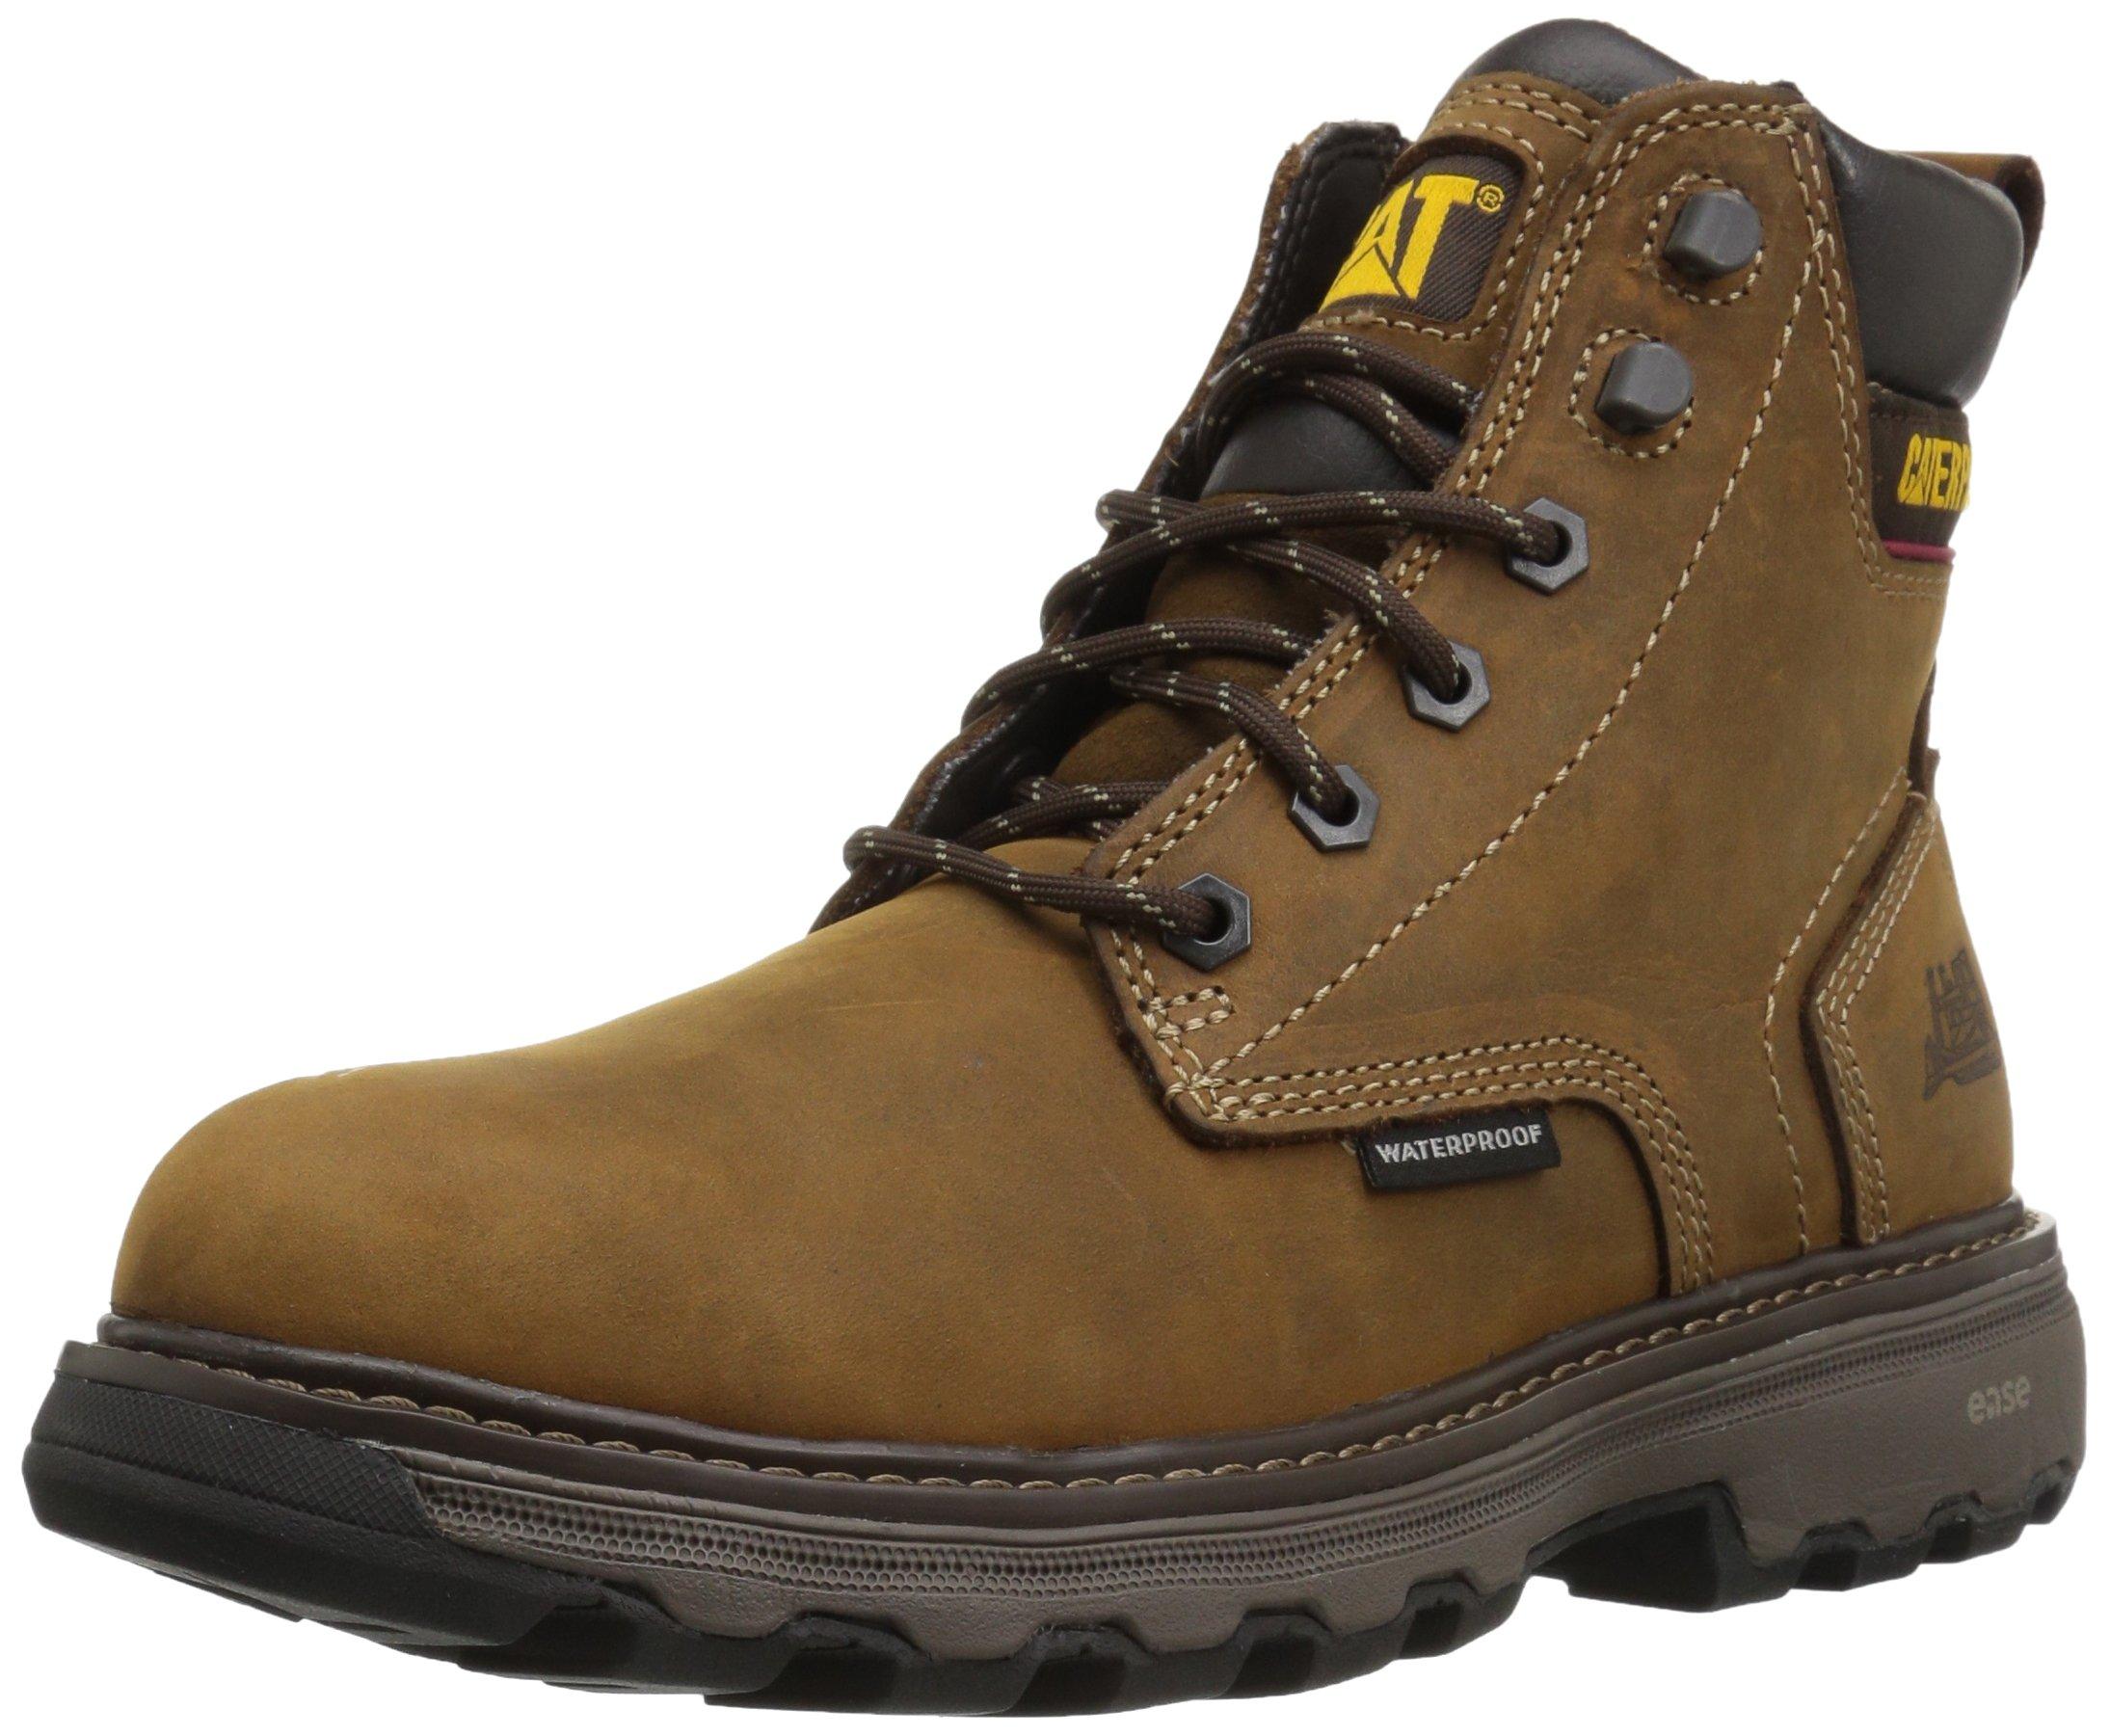 Caterpillar Men's Precision Waterproof Work Boot, Dark Brown, 11.5 M US by Caterpillar (Image #1)